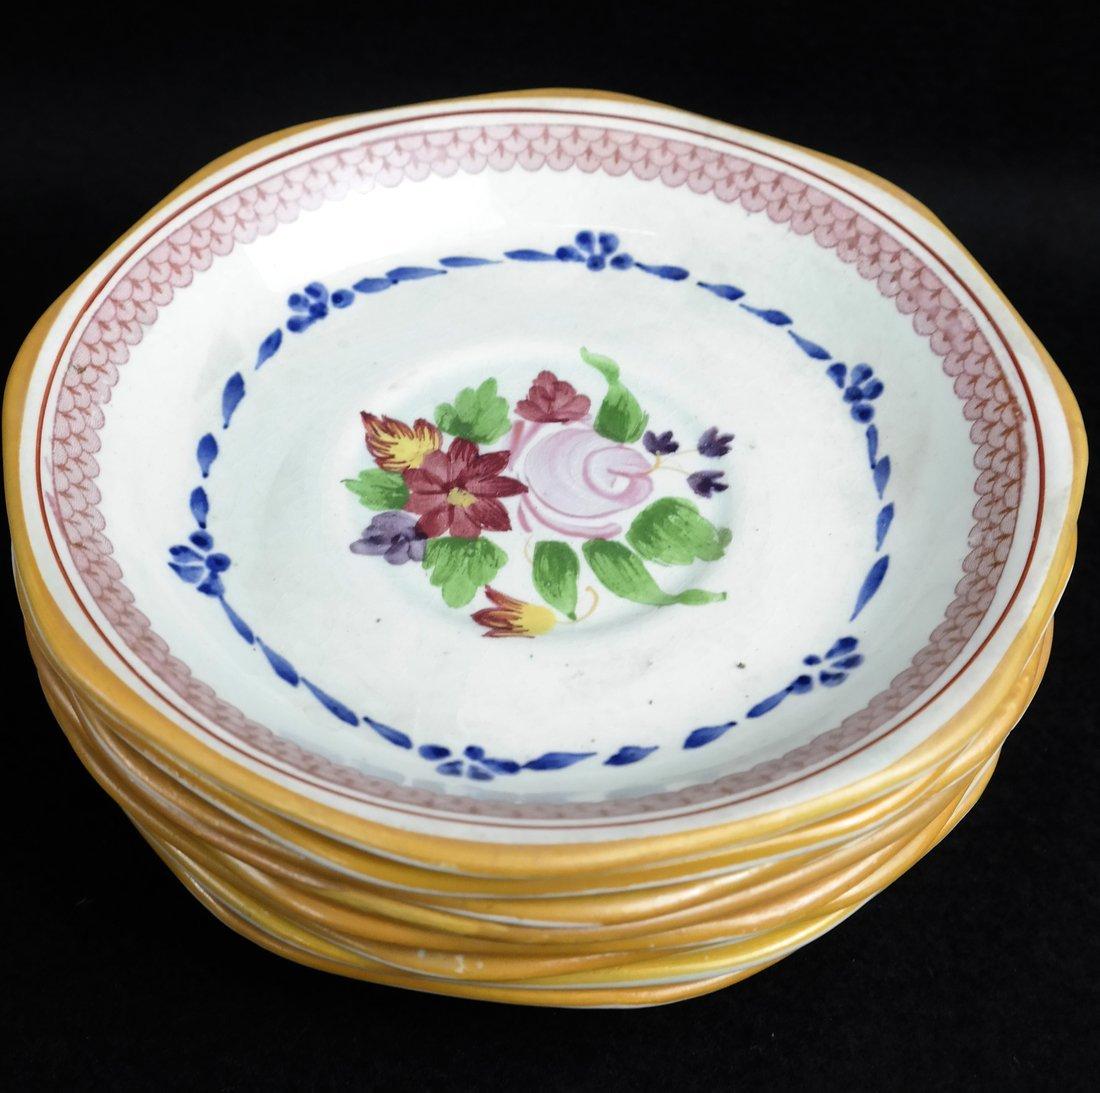 35 Various English Porcelain Items - 7